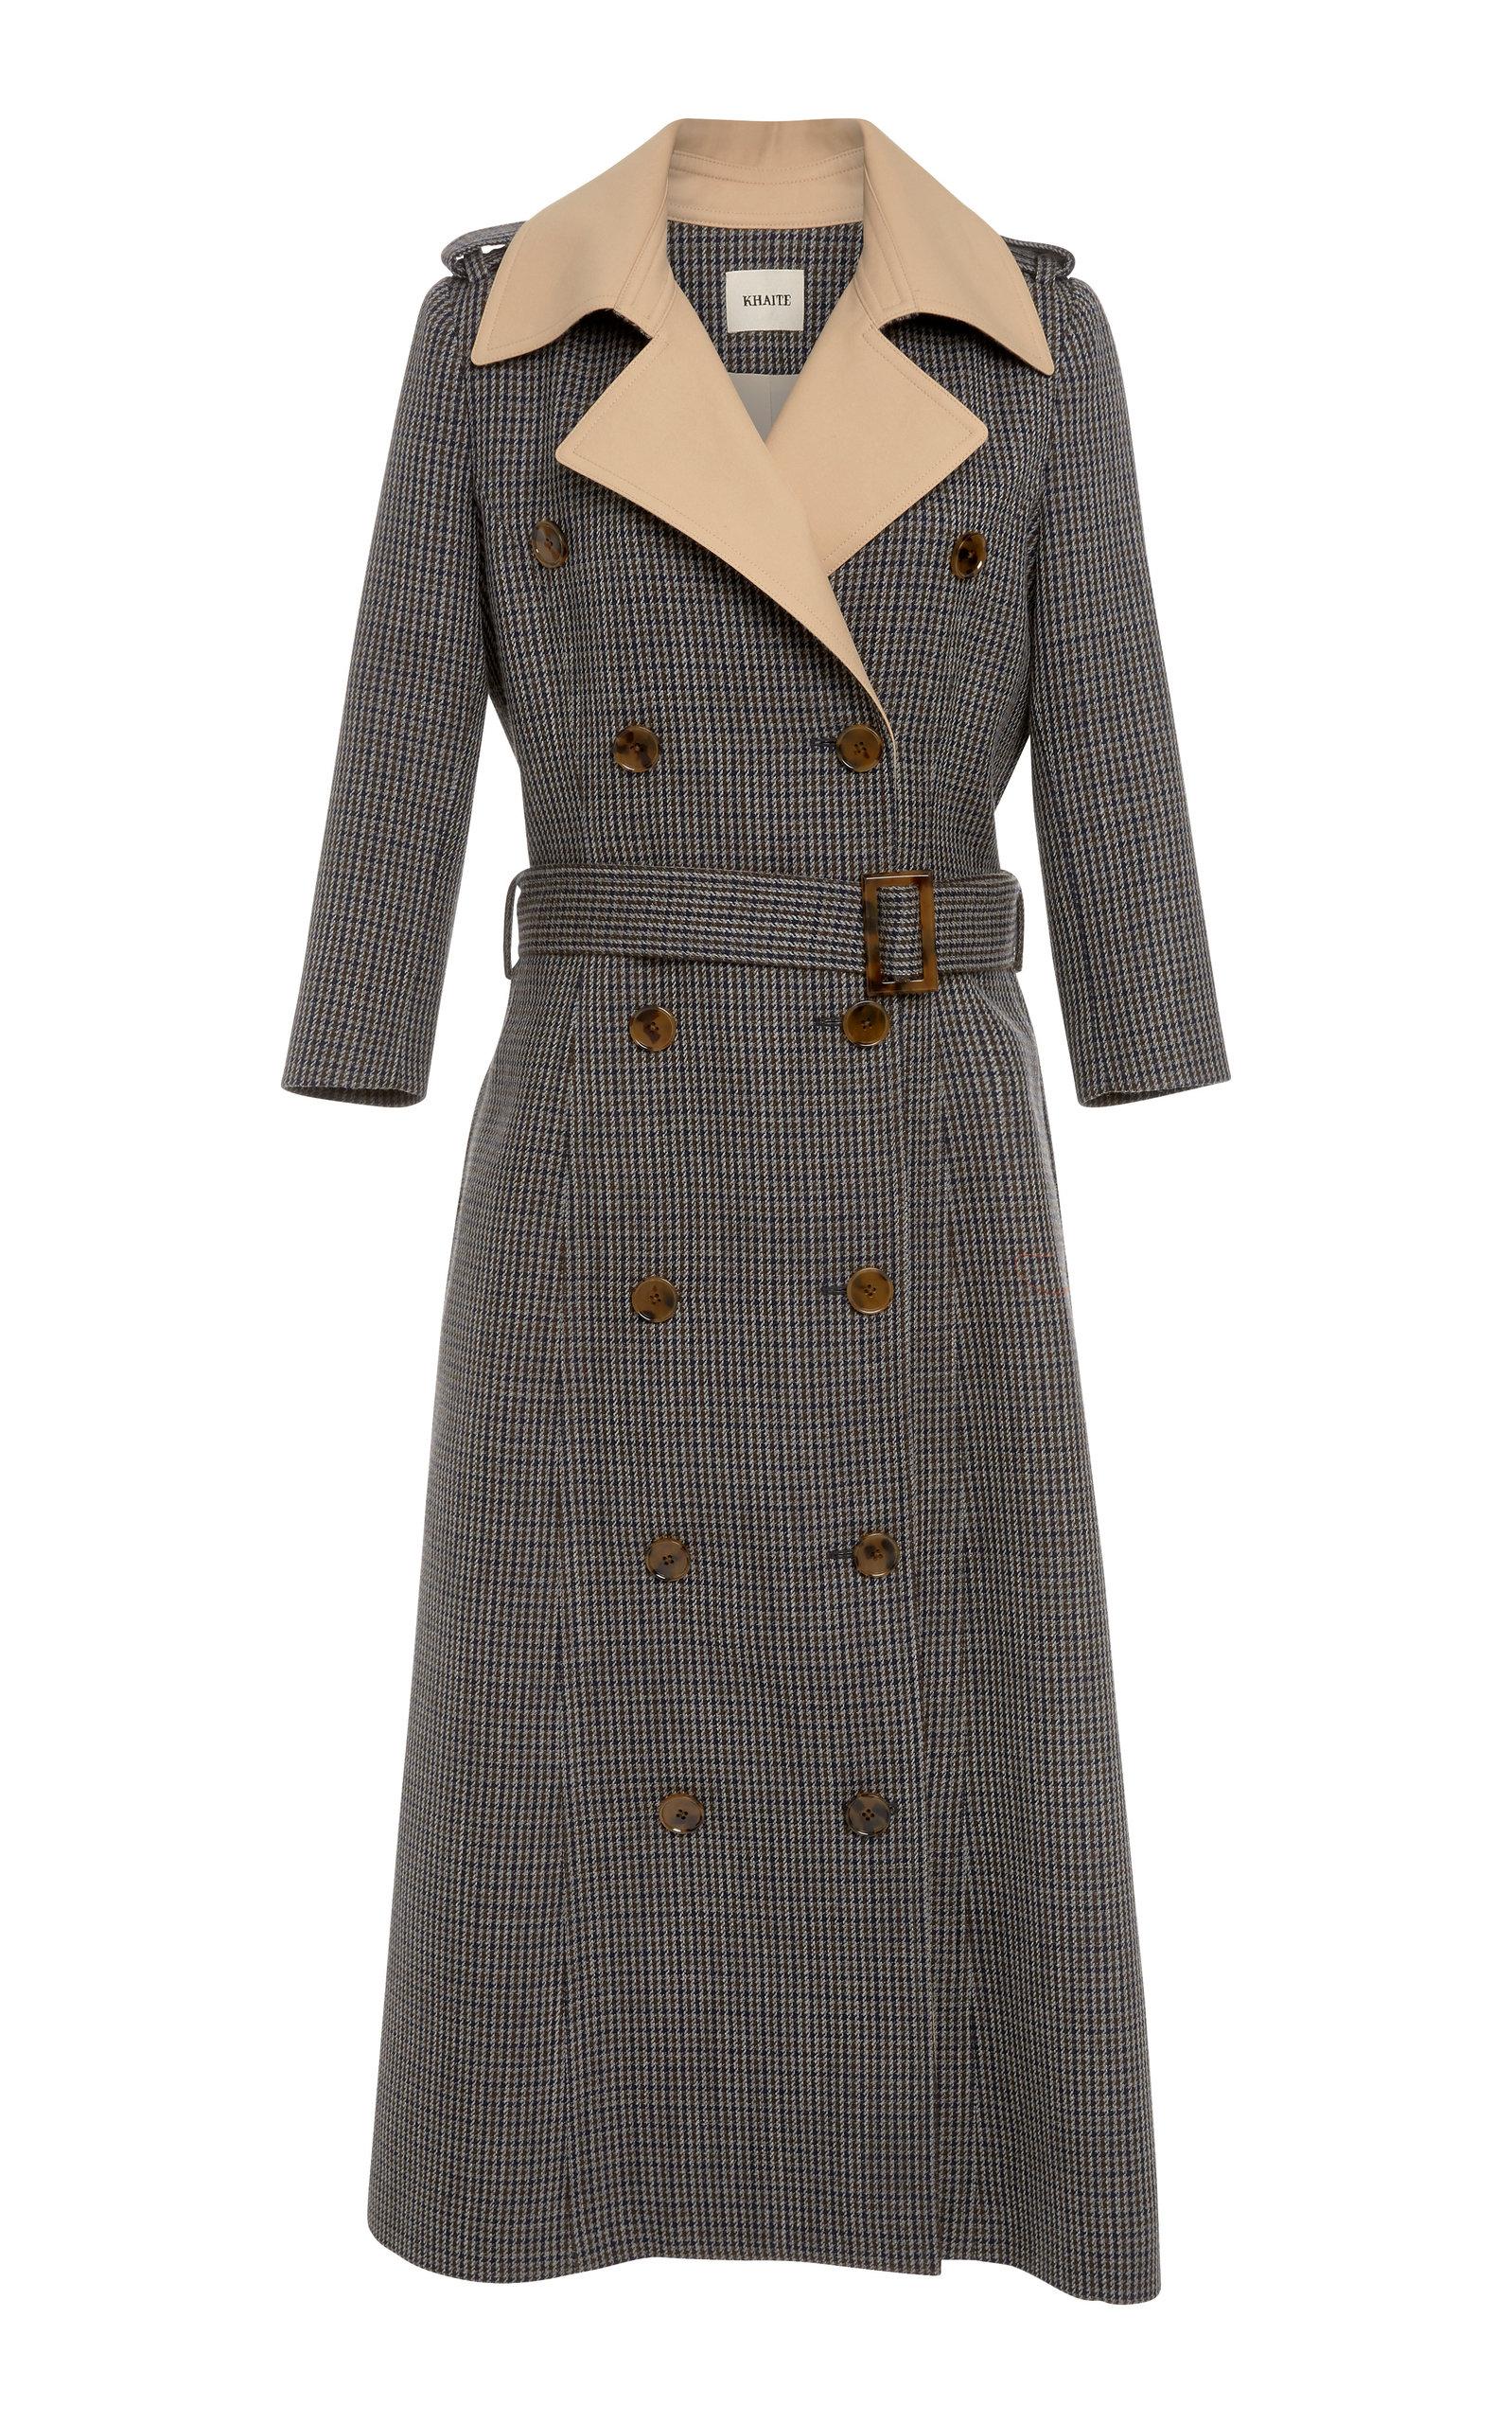 KHAITE Charlotte Houndstooth Wool-Tweed Trench Coat in Brown